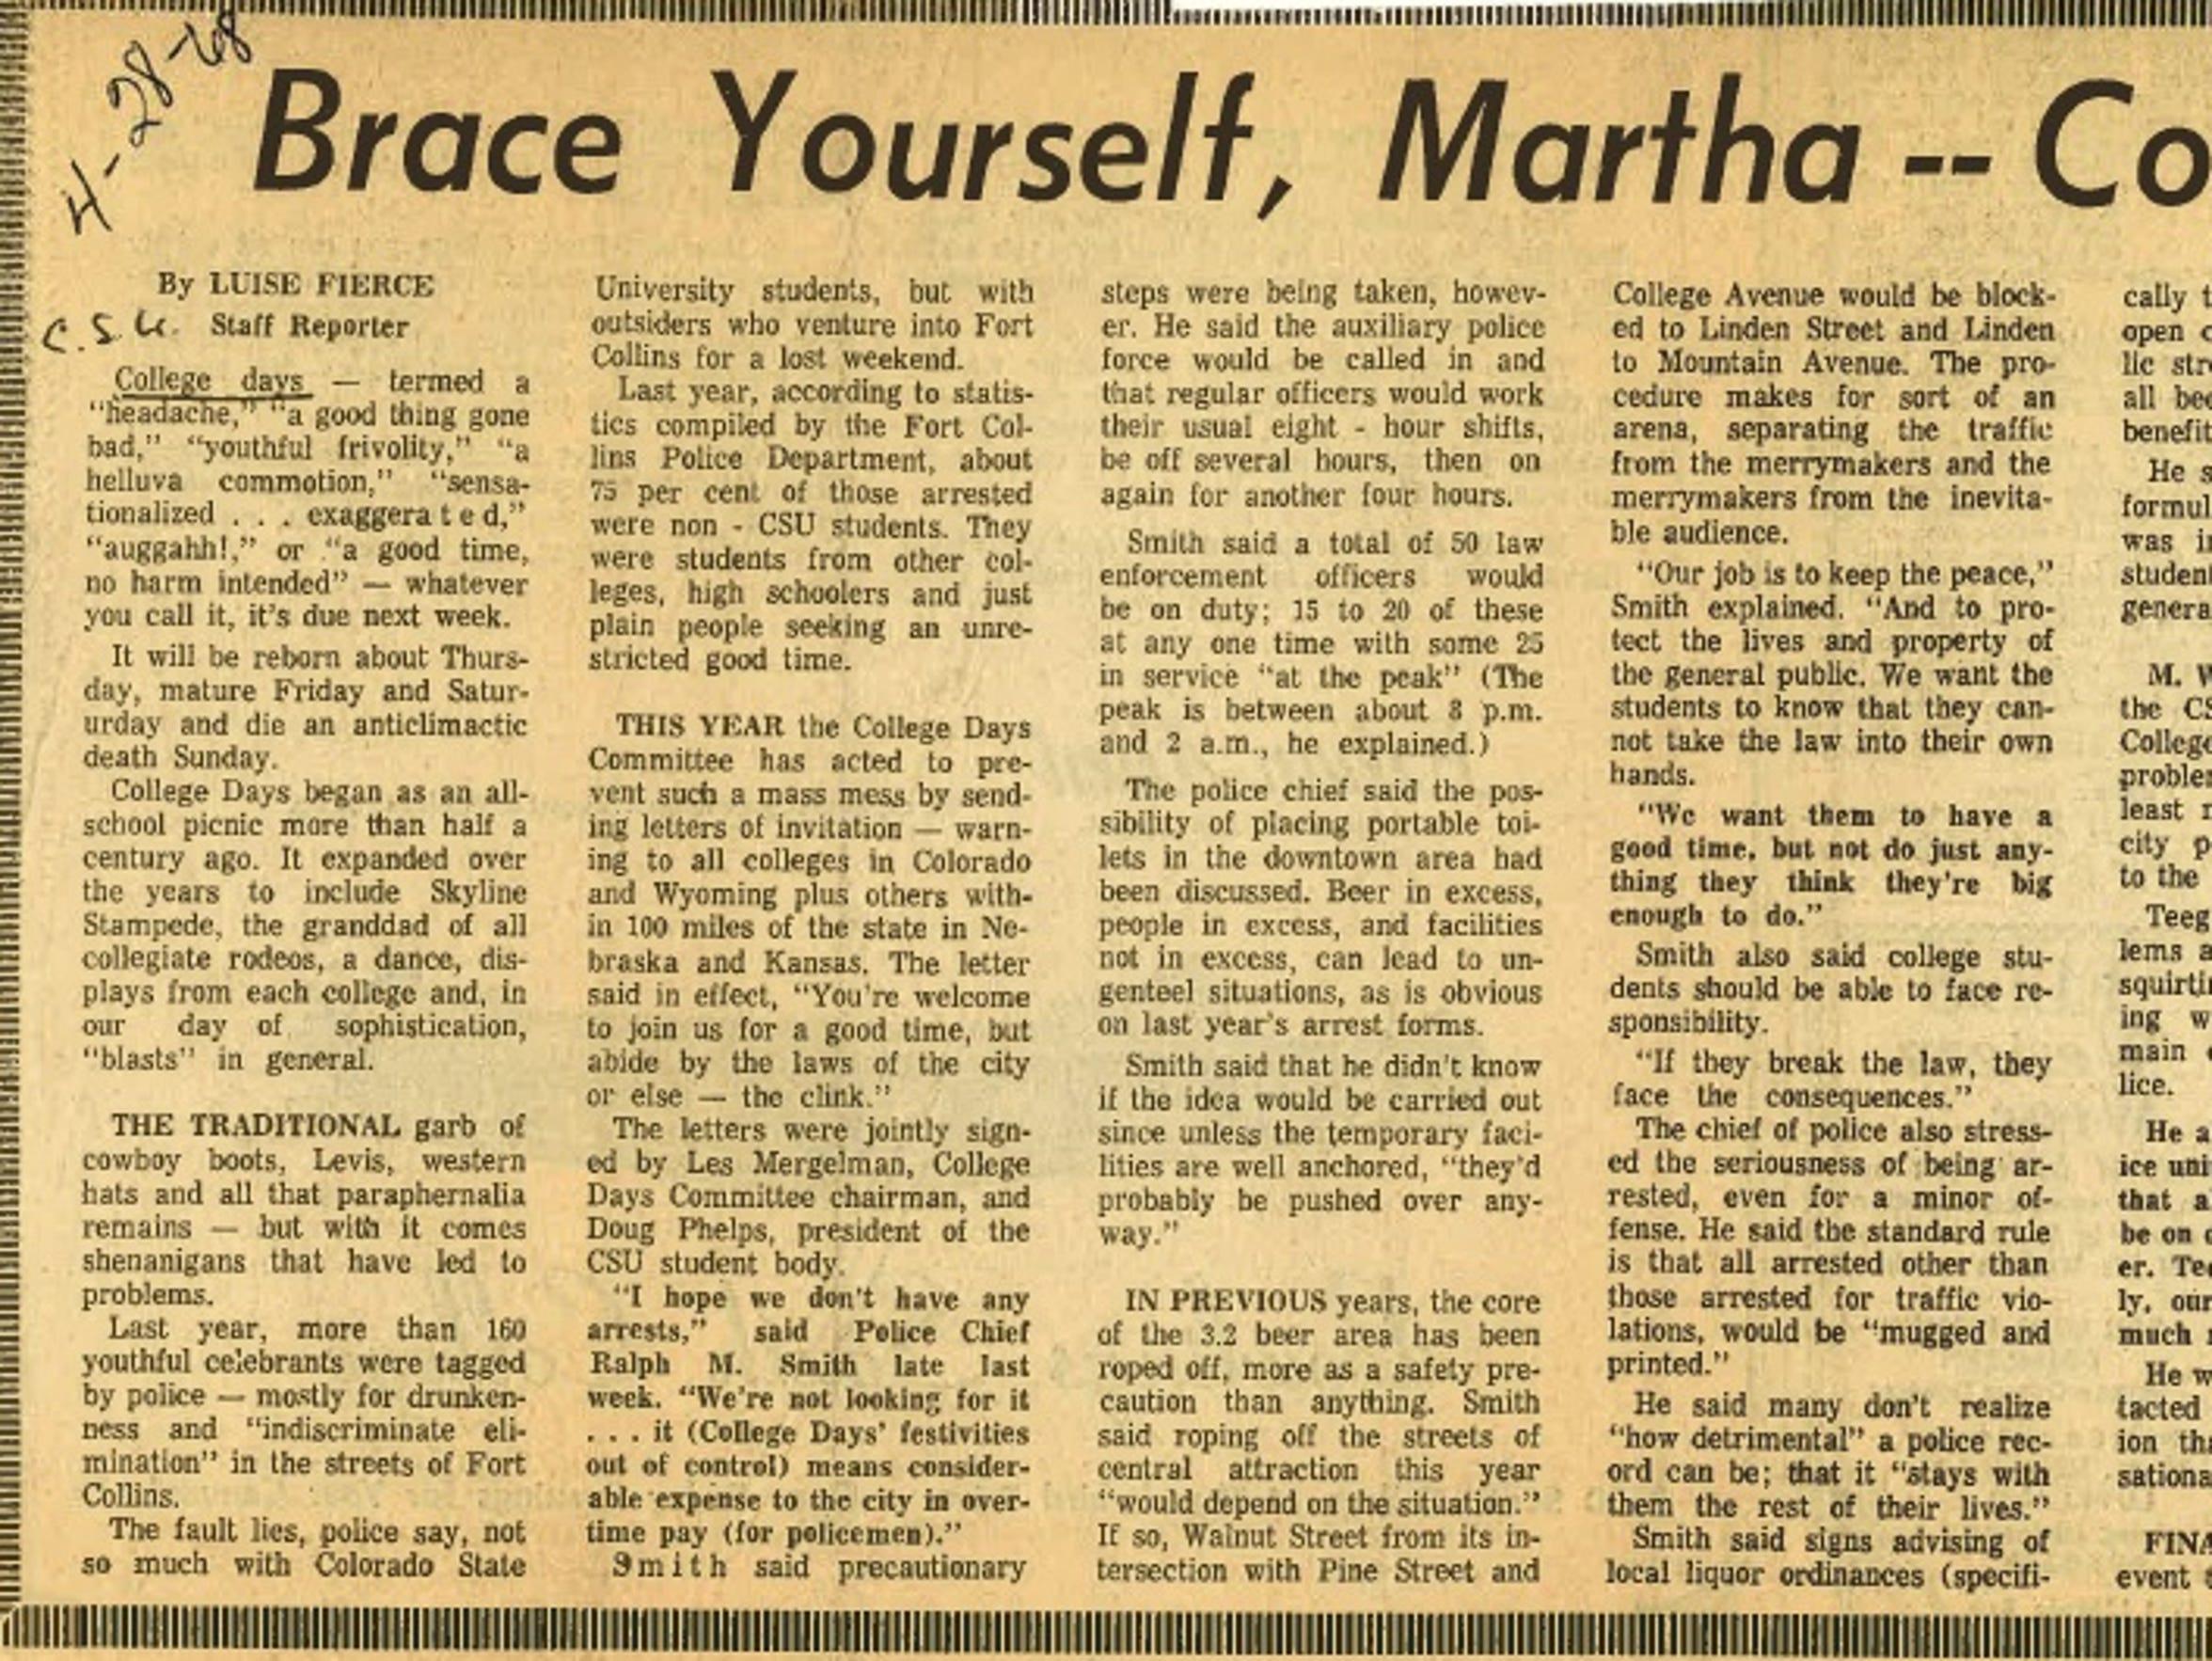 A Coloradoan headline from 1968.